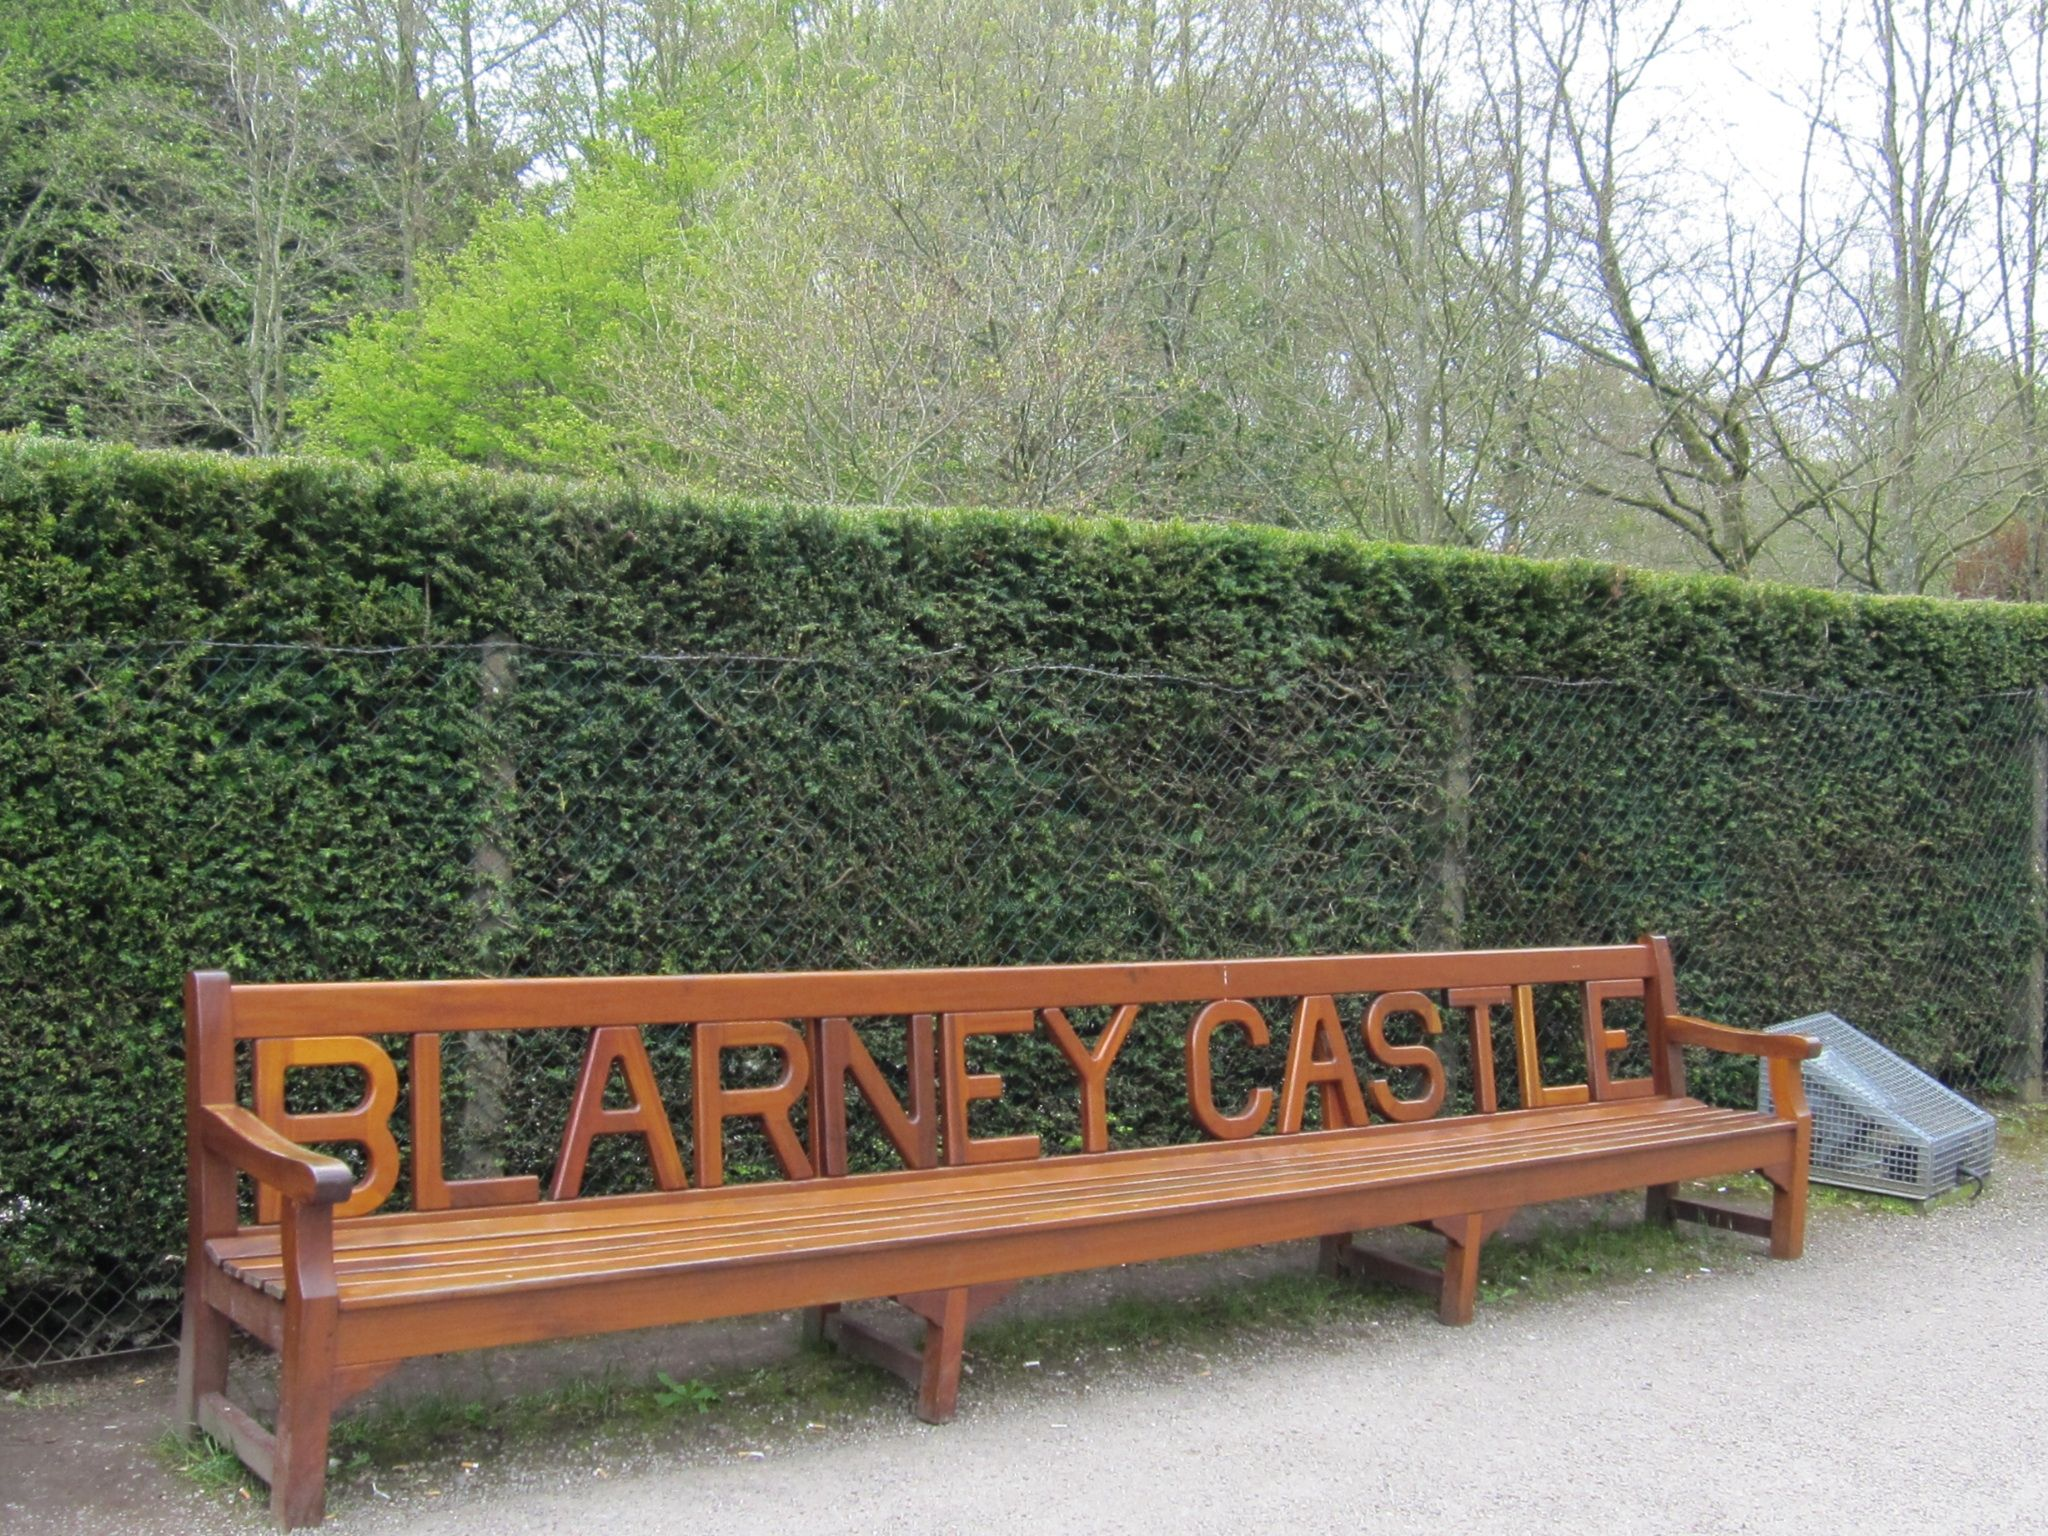 Blarney Castle Outdoor decor, Decor, Outdoor furniture